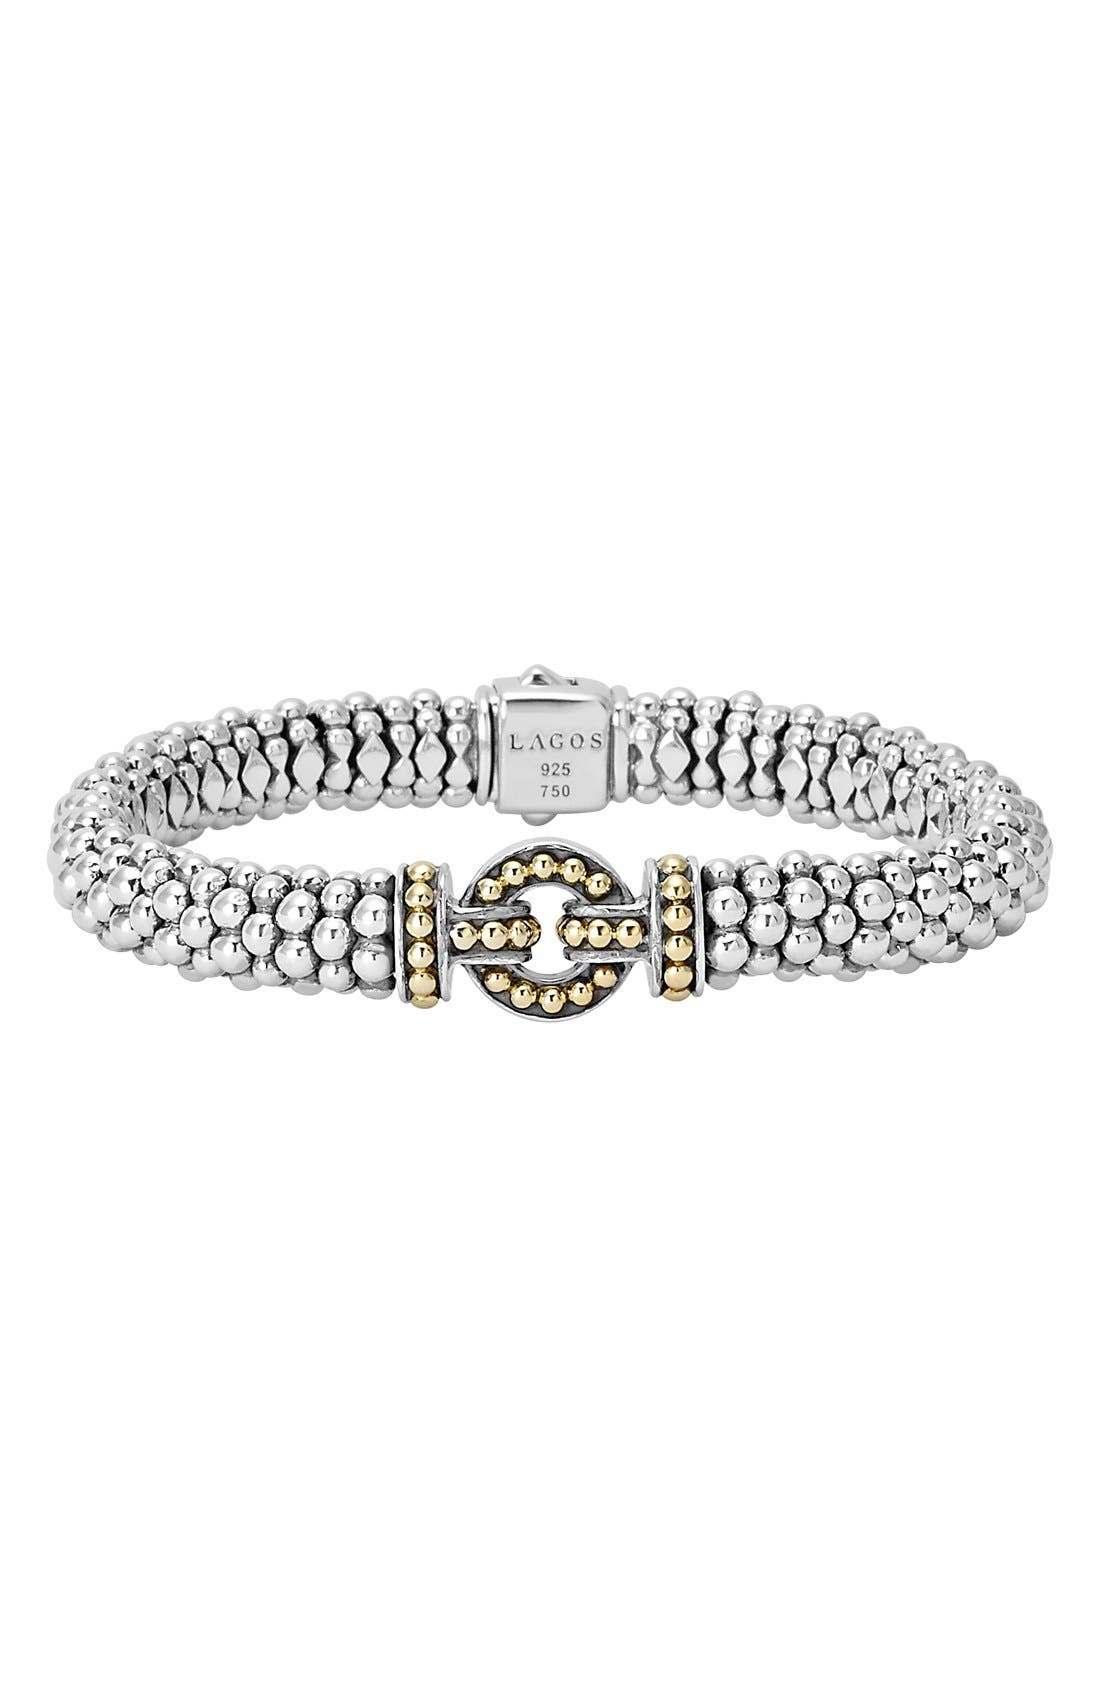 LAGOS 'Enso' Two-Tone Rope Caviar Bracelet